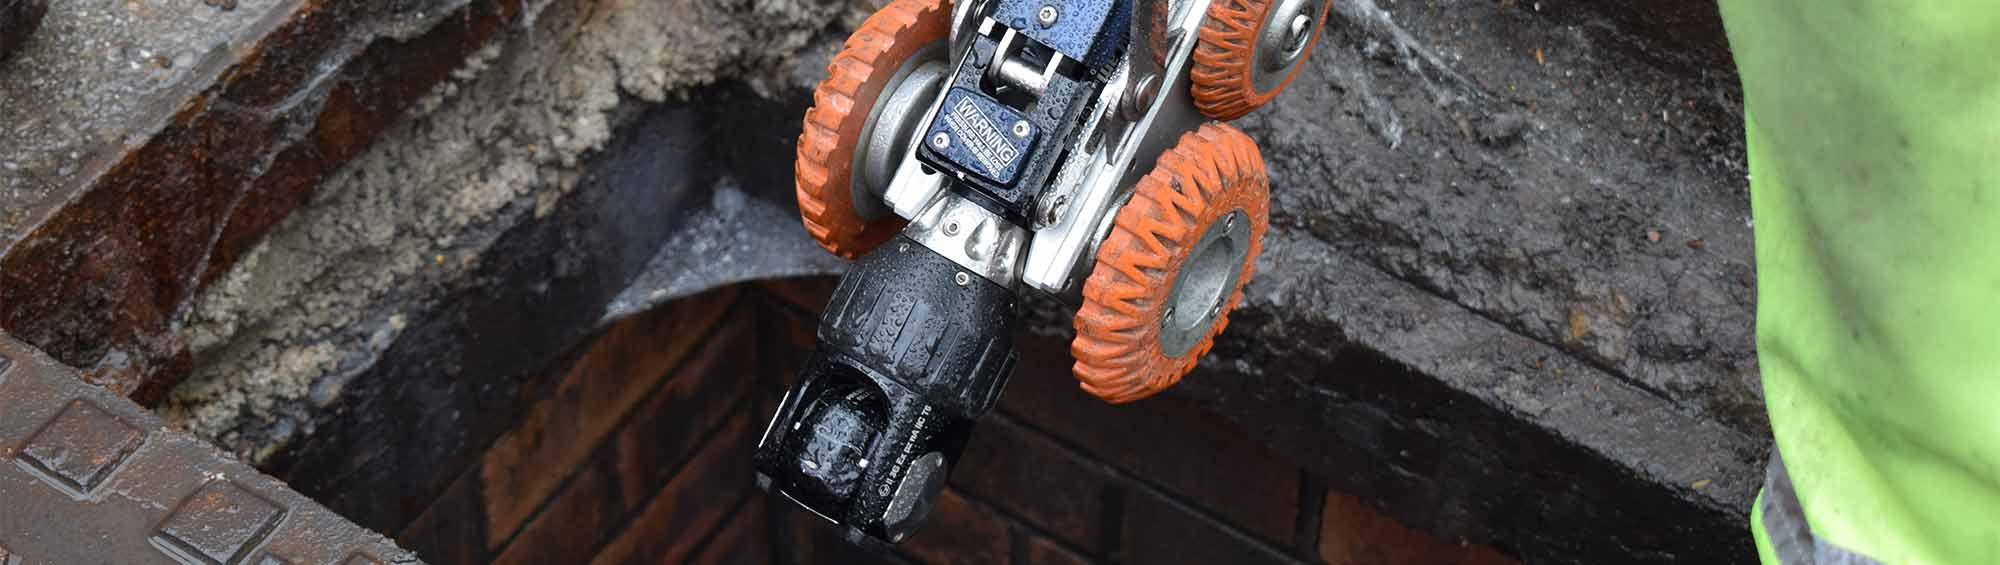 cctv drain survey camera